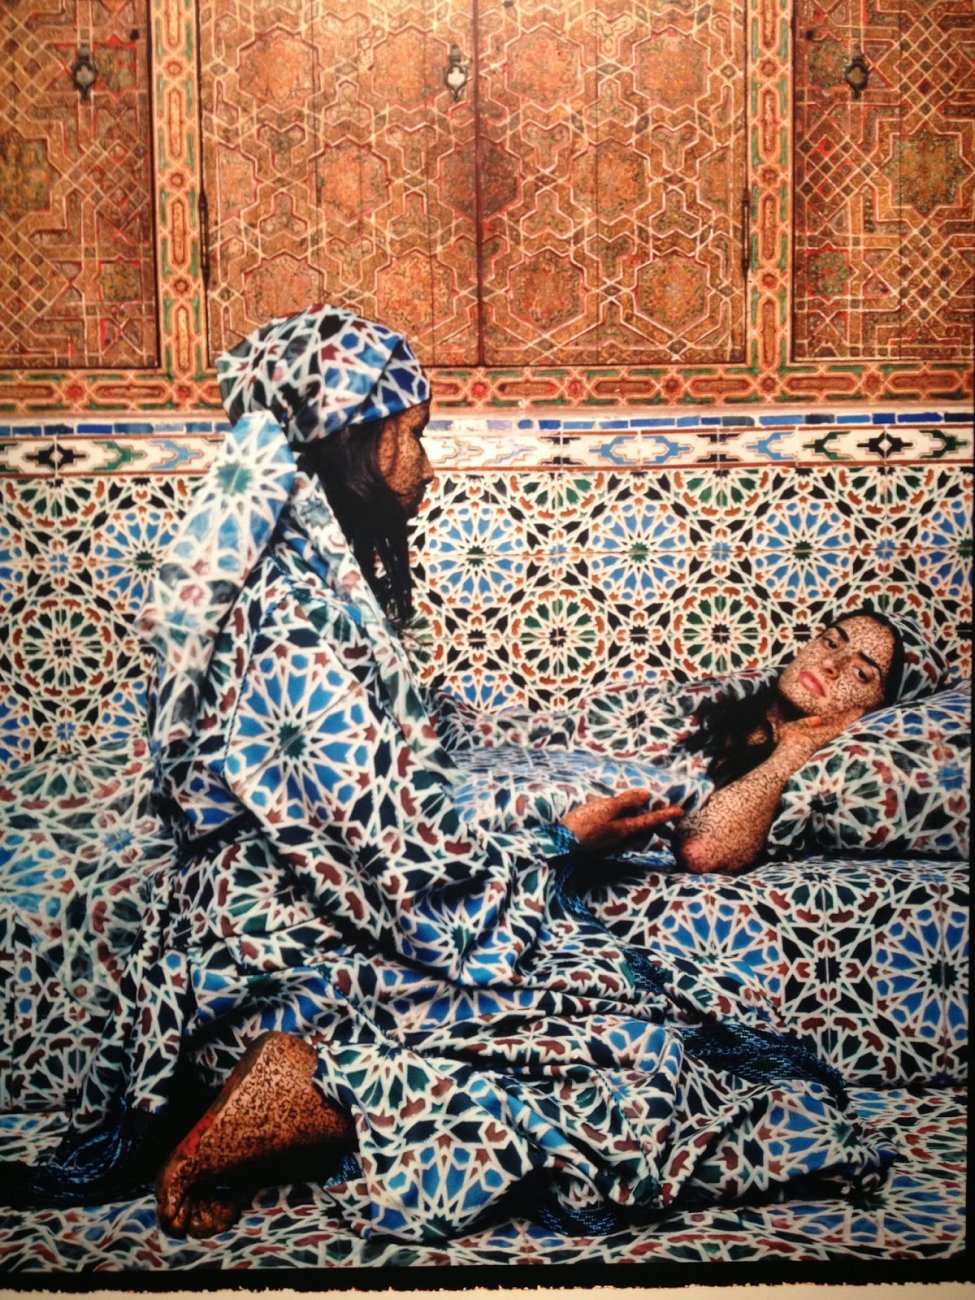 lalla essaydi african art museum Lalla essaydi biography q&a: lalla essaydi challenges muslim, gender stereotypes at museum of african art pbs pbs  lalla essaydi art analysis.